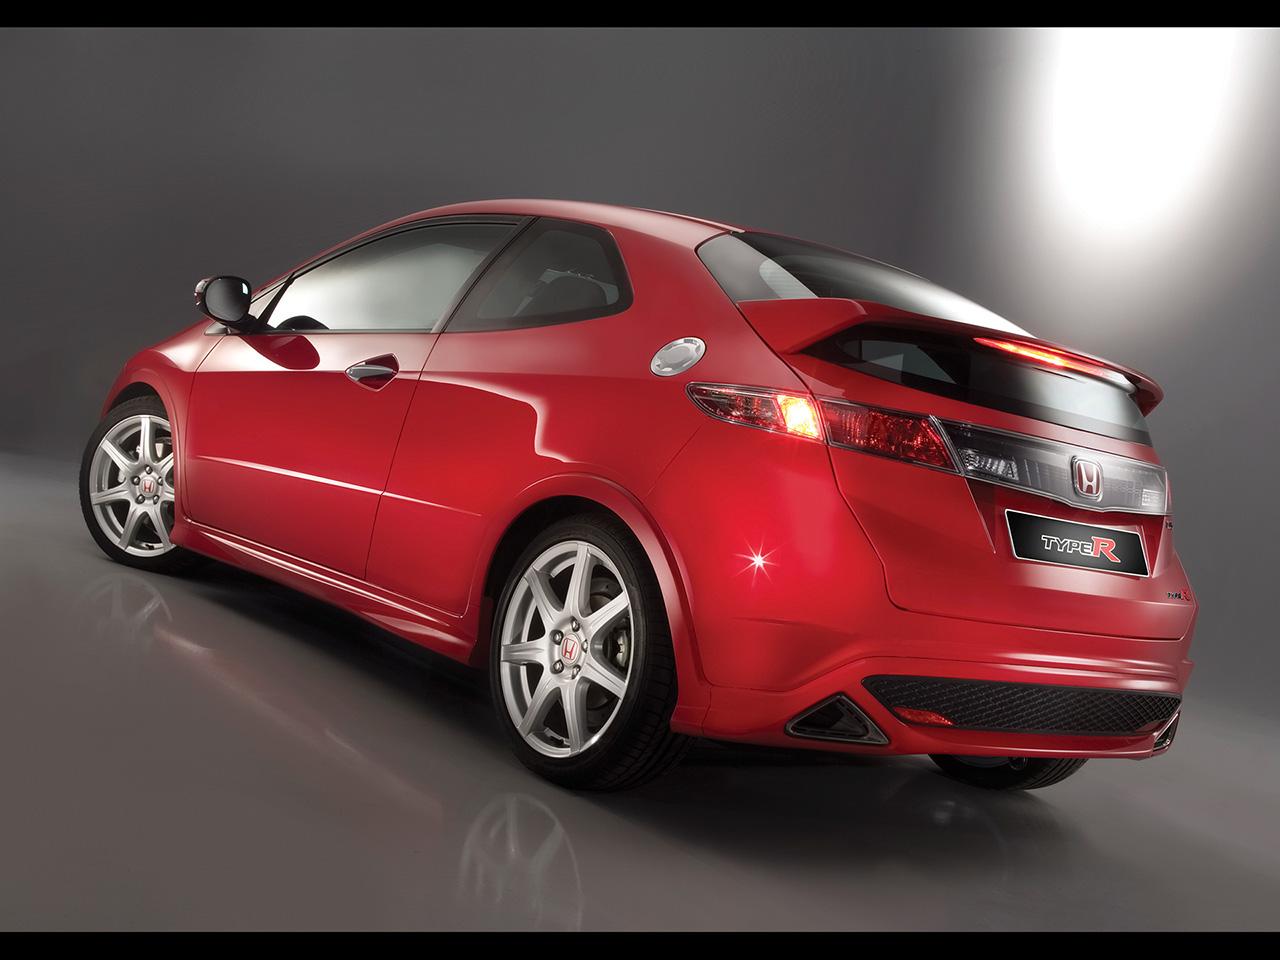 http://1.bp.blogspot.com/-8kKUmx_ve0Y/Ti1n0-tC50I/AAAAAAAAAcY/Yow_M3FuyhM/s1600/2007-Honda-Civic-Type-R-Rear-Angle-Tilt-1280x960.jpg